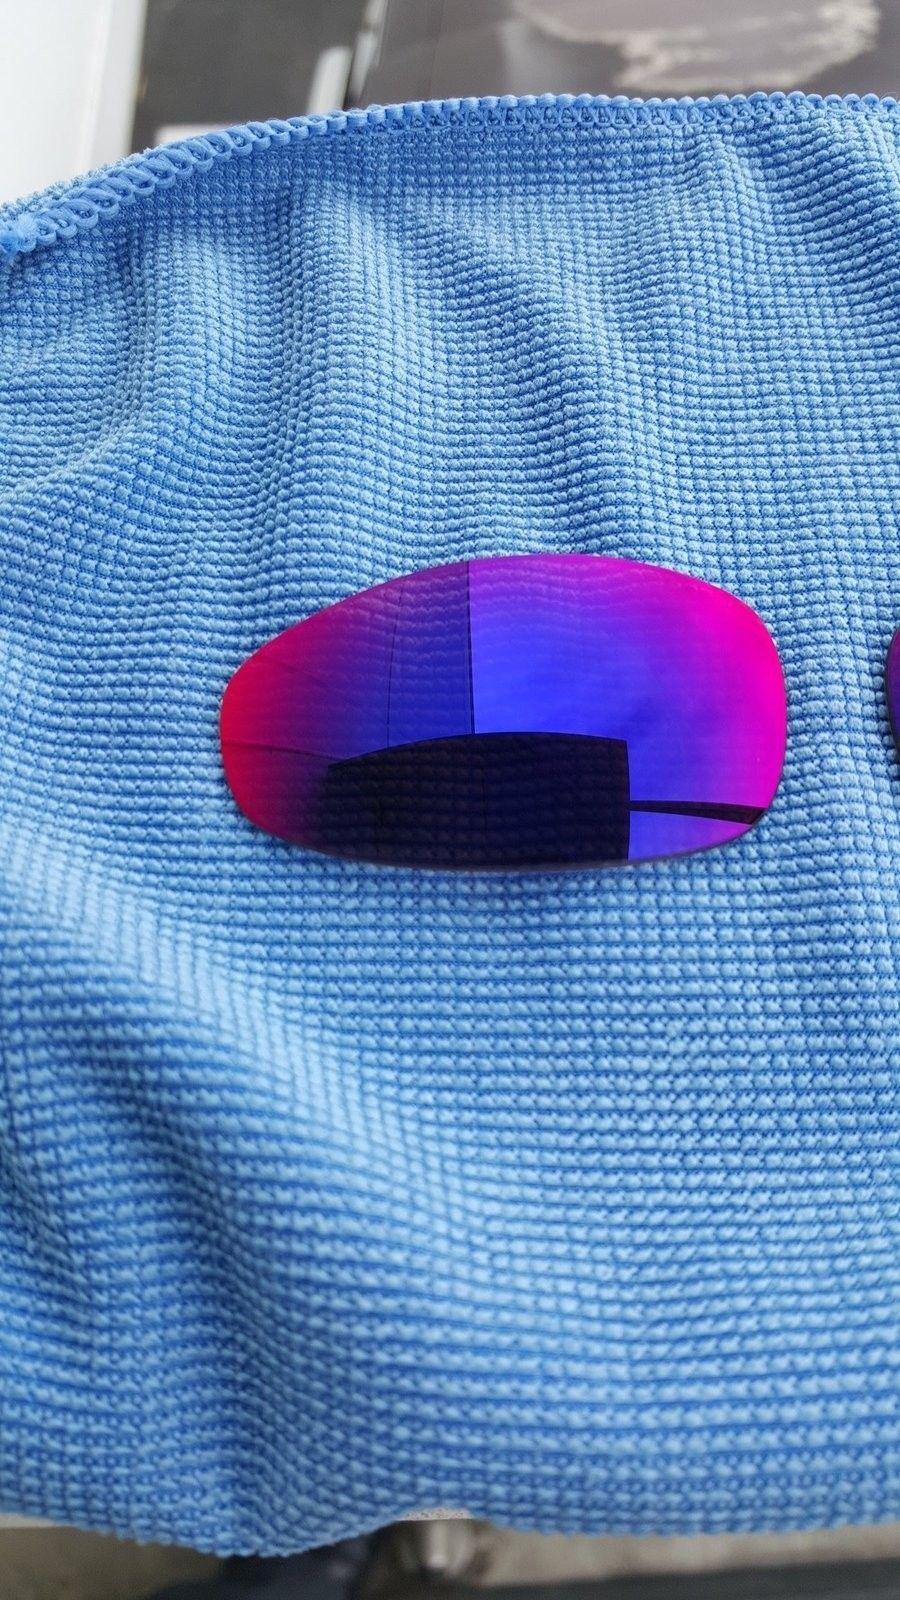 Juliet - 00 Red Iridium Polarized Lens - 95.00 Shipped - 20151027_113430.jpg.jpeg